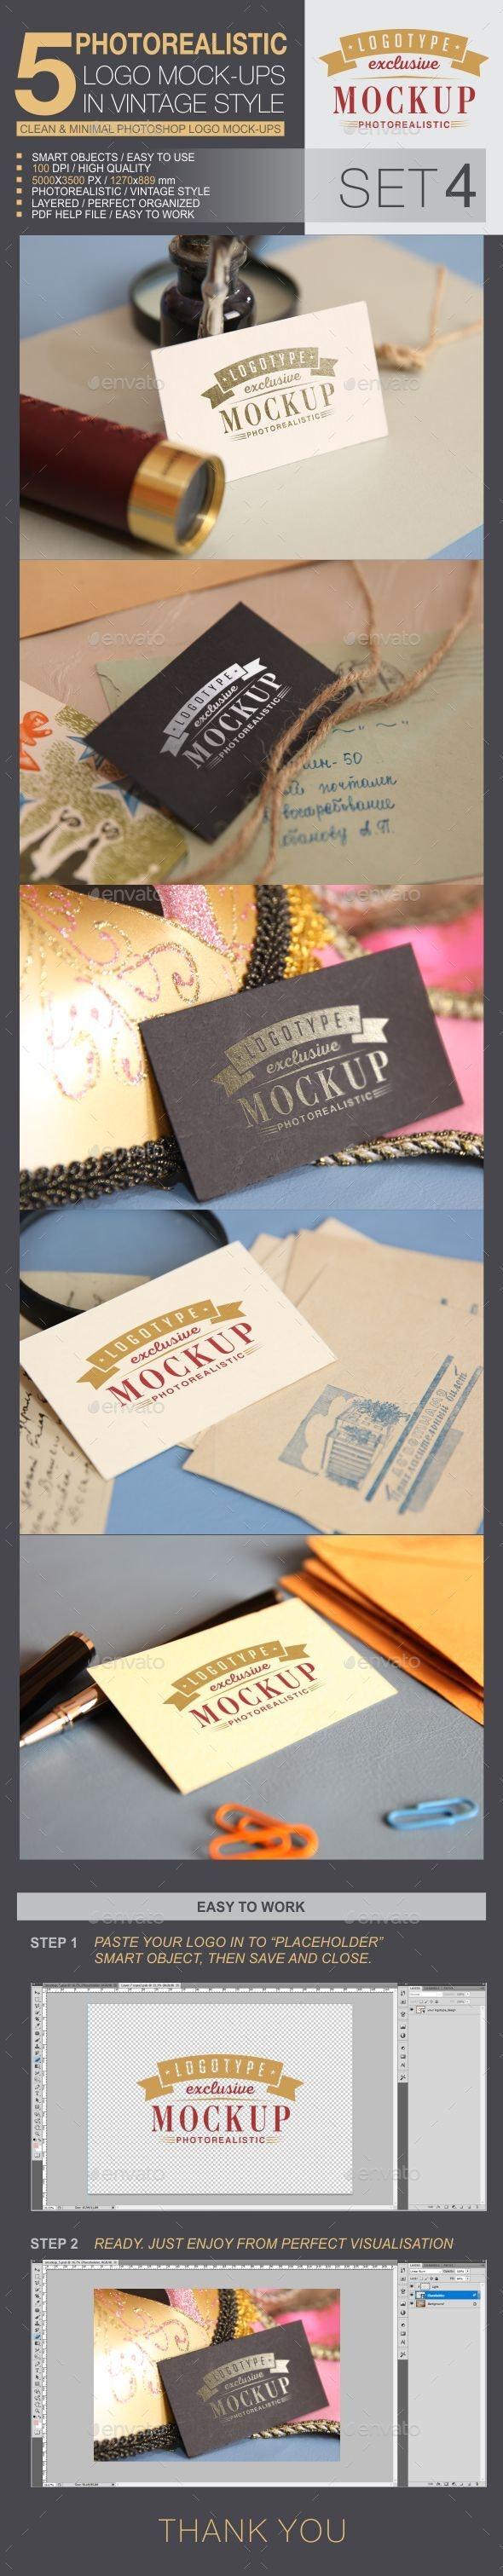 5 Logo Mock-Ups In Vintage Style - Set 4 - Logo Product Mock-Ups